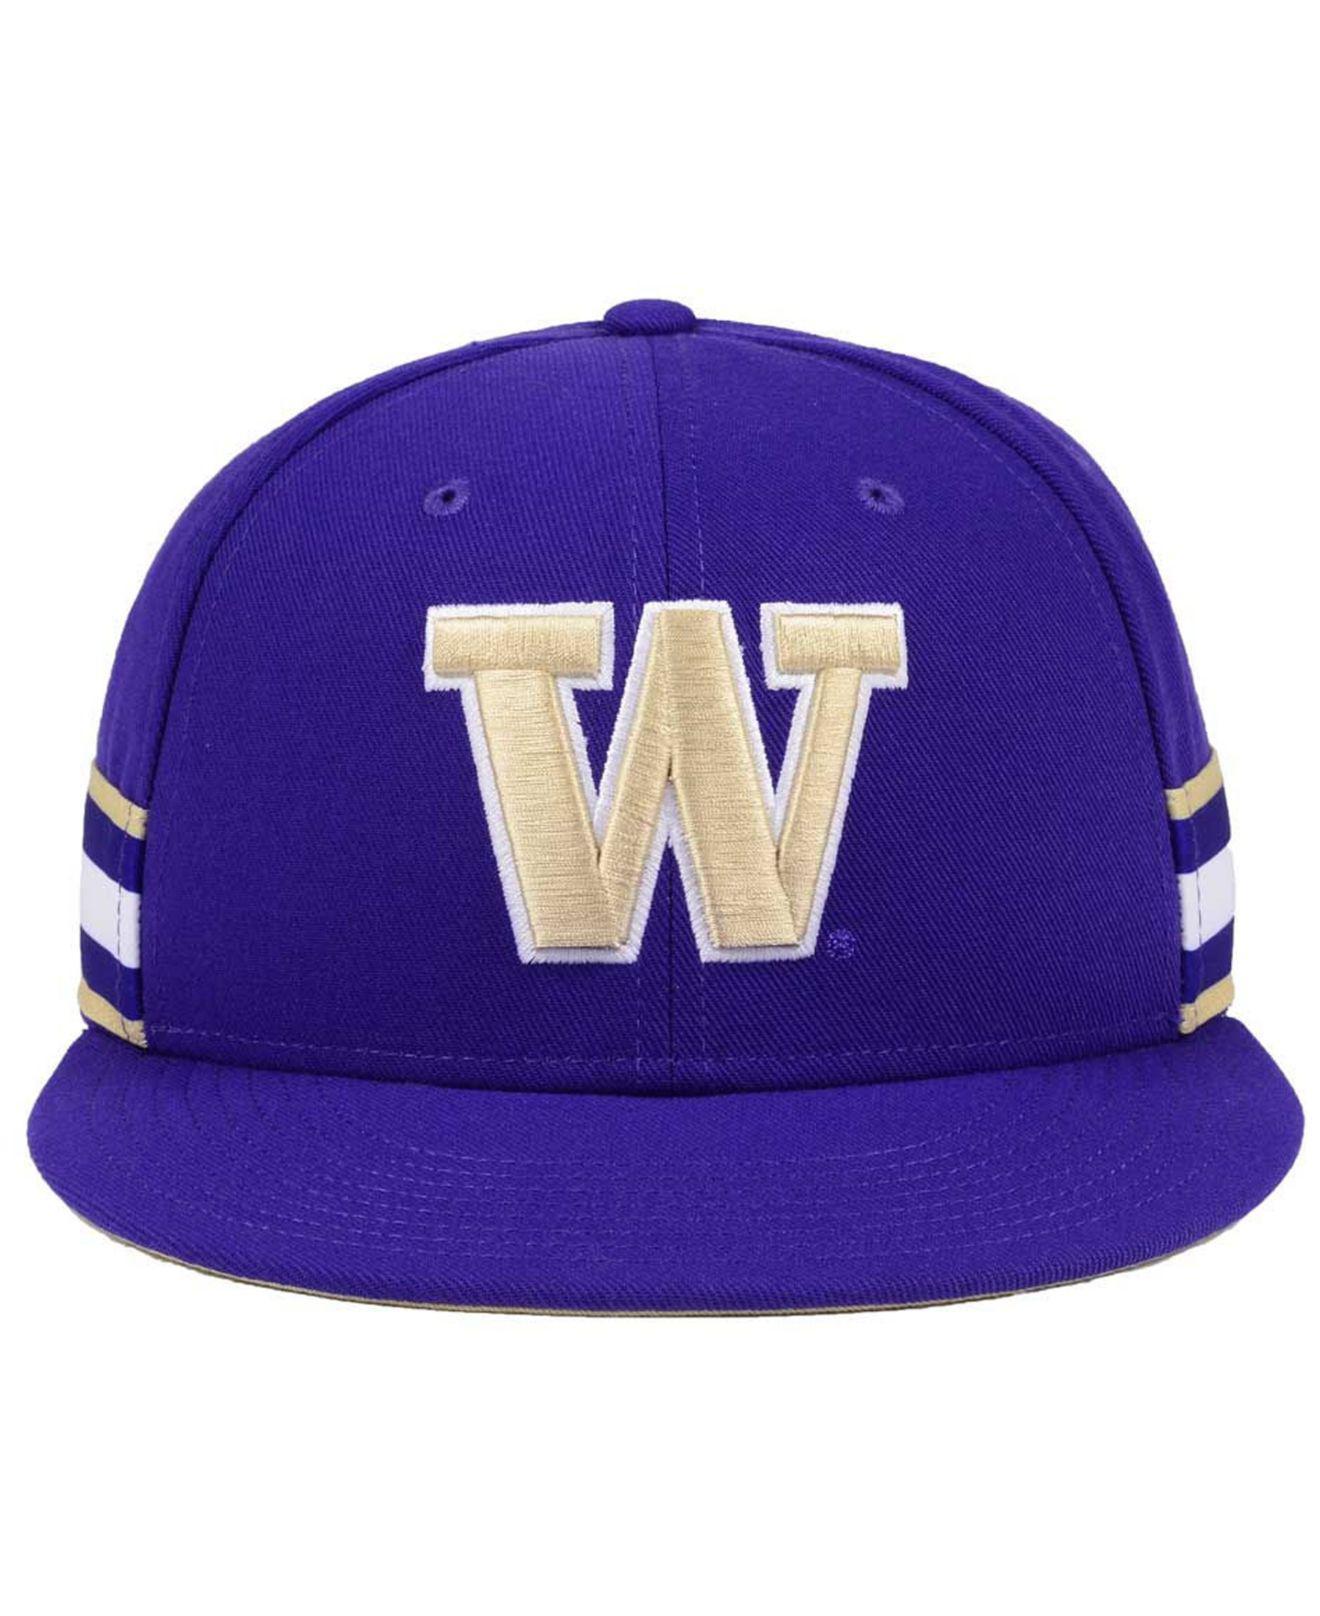 best service e62d6 77502 ... duke blue devils sleeve stripe raglan 3 4 sleeve tri c11d0 1a023  shop lyst  nike true woven stripe snapback cap in purple for men d32da a11ce